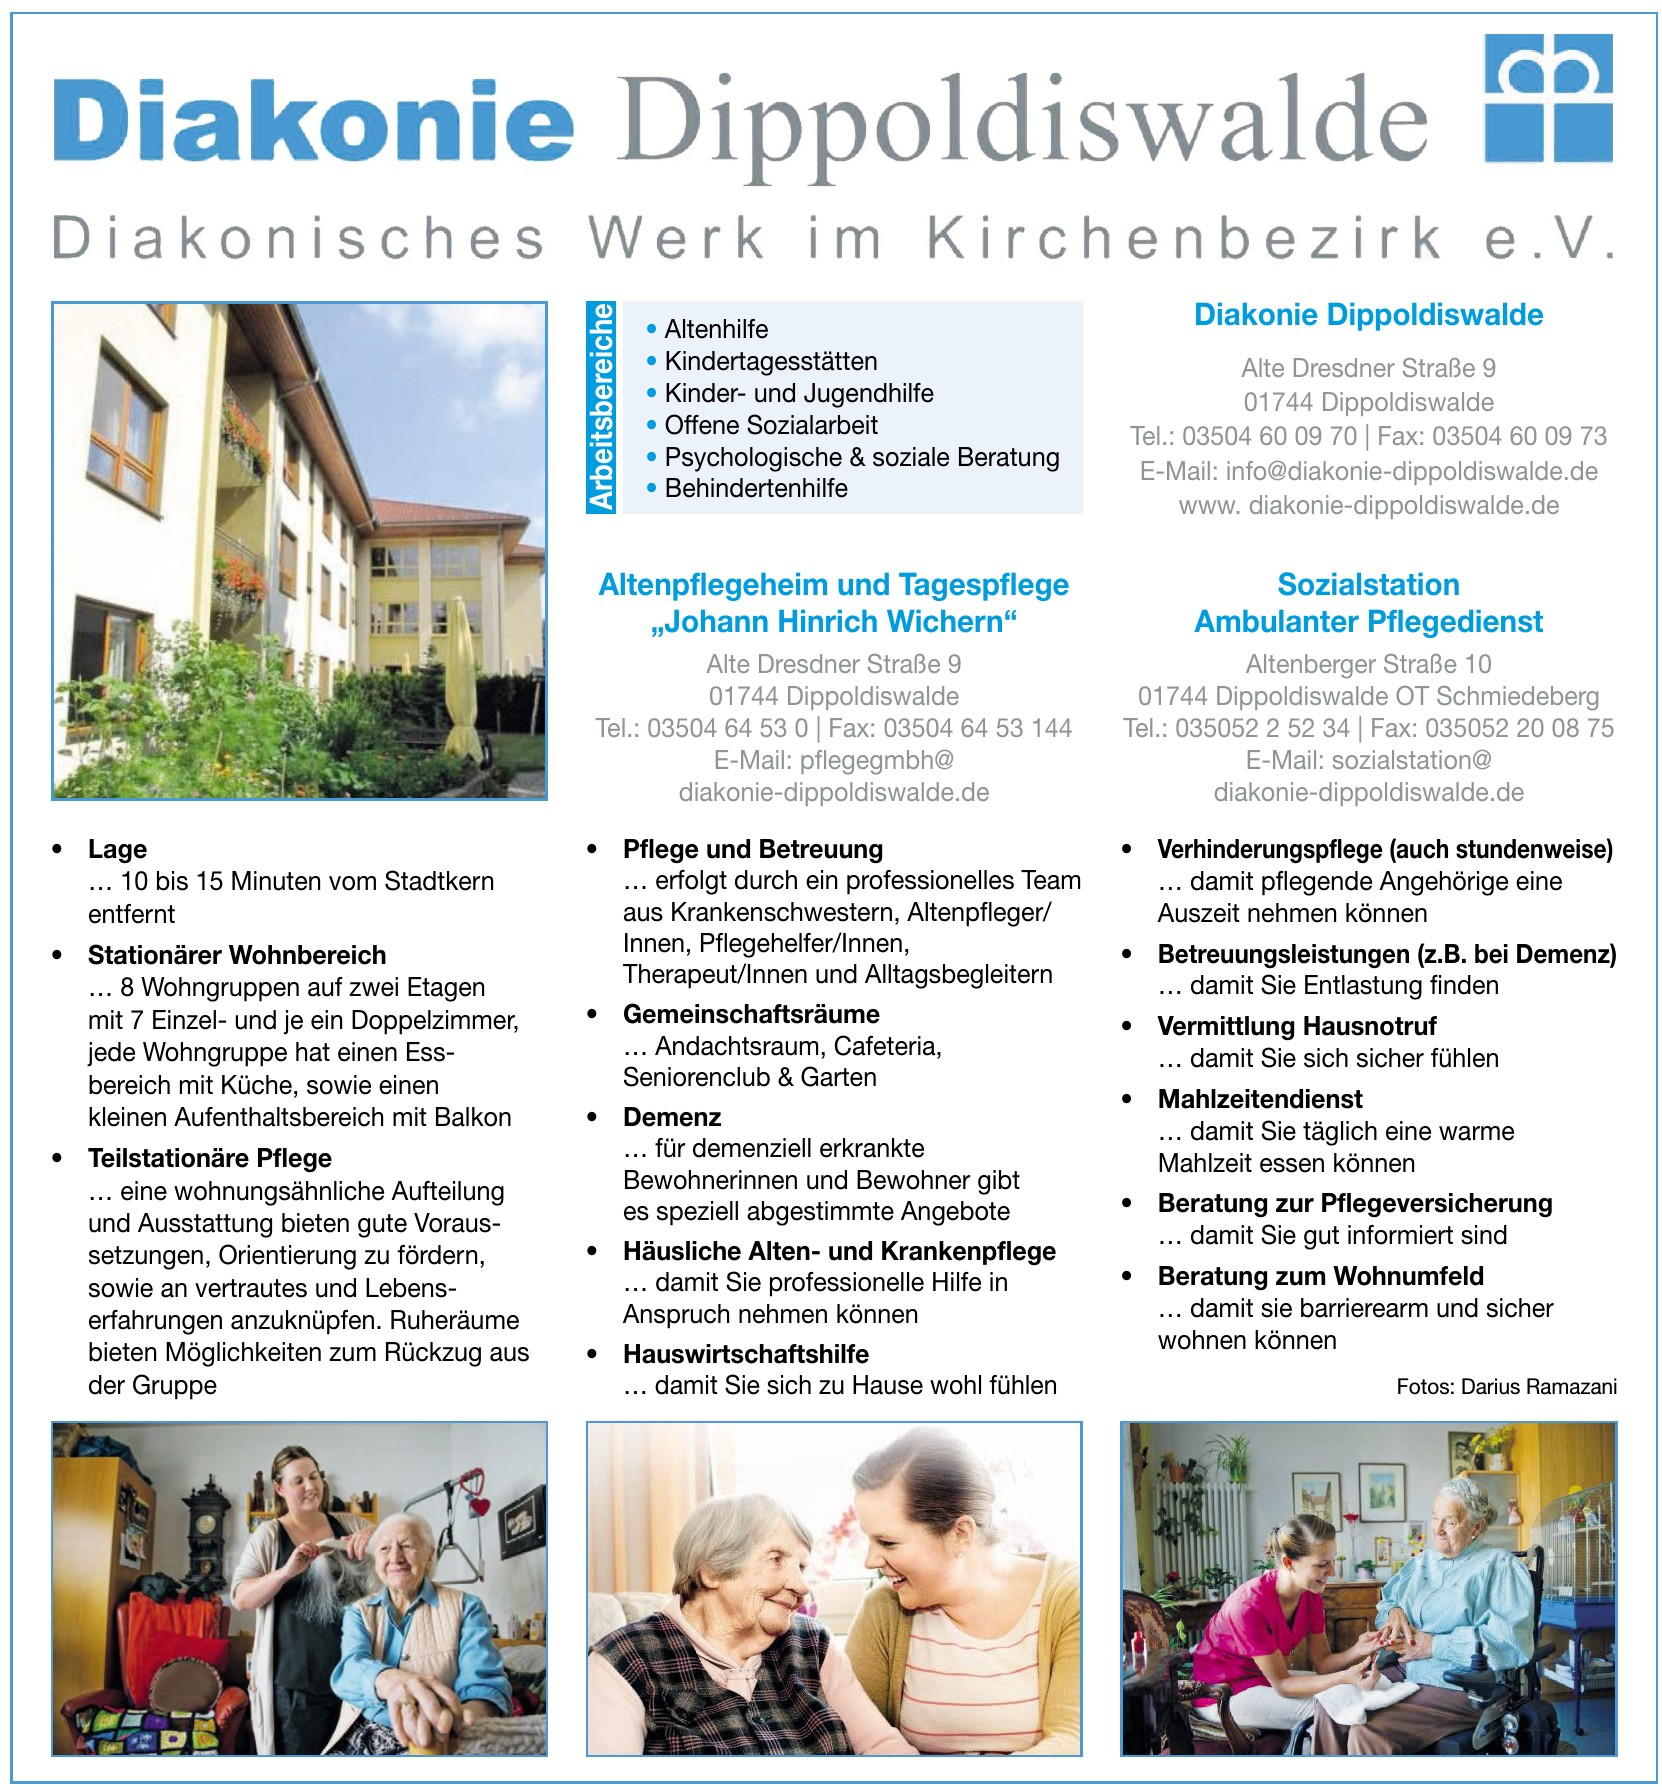 Diakonie Dippoldiswalde Diakonisches Werk im Kirchenbezirk e. V.